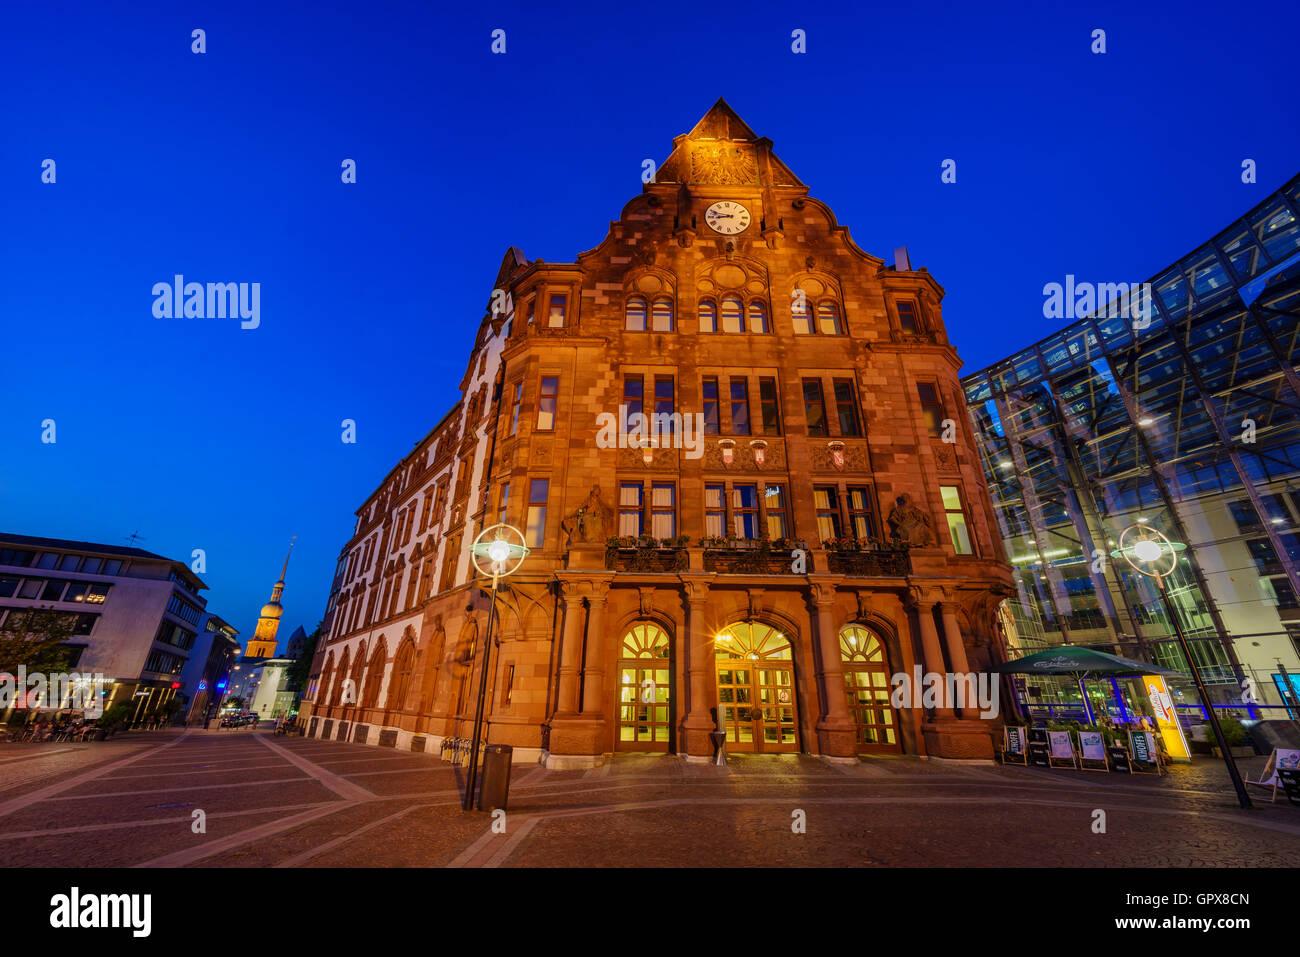 Dortmund, AUG 31: The beautiful Standesamt Dortmund on AUG 31, 2016 at Dortmund, Germany - Stock Image